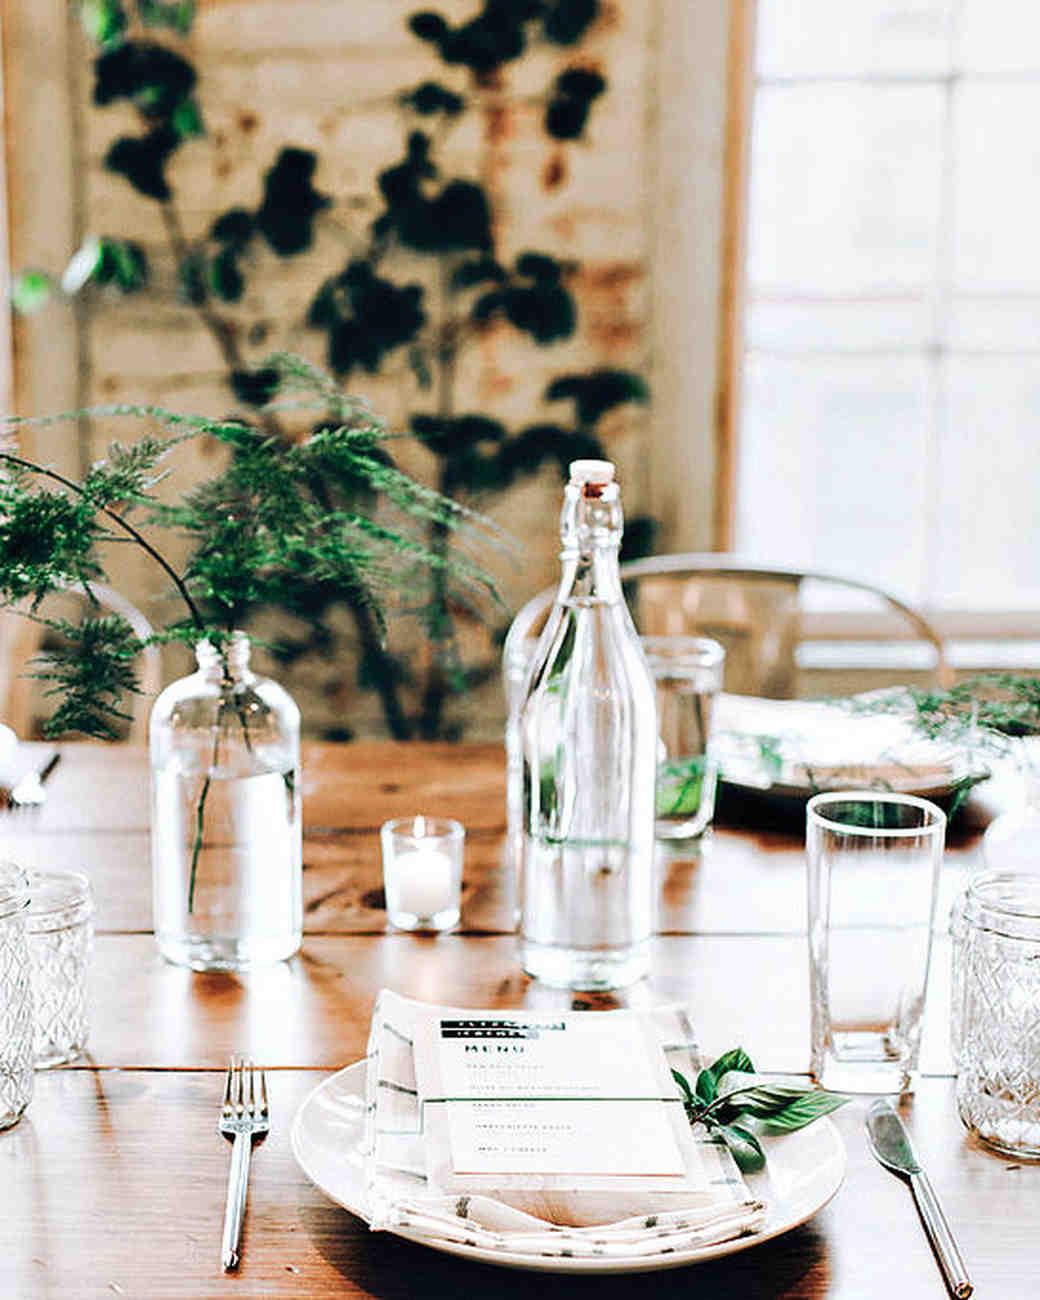 moira-dustin-real-wedding-centerpiece-place-setting_vert.jpg